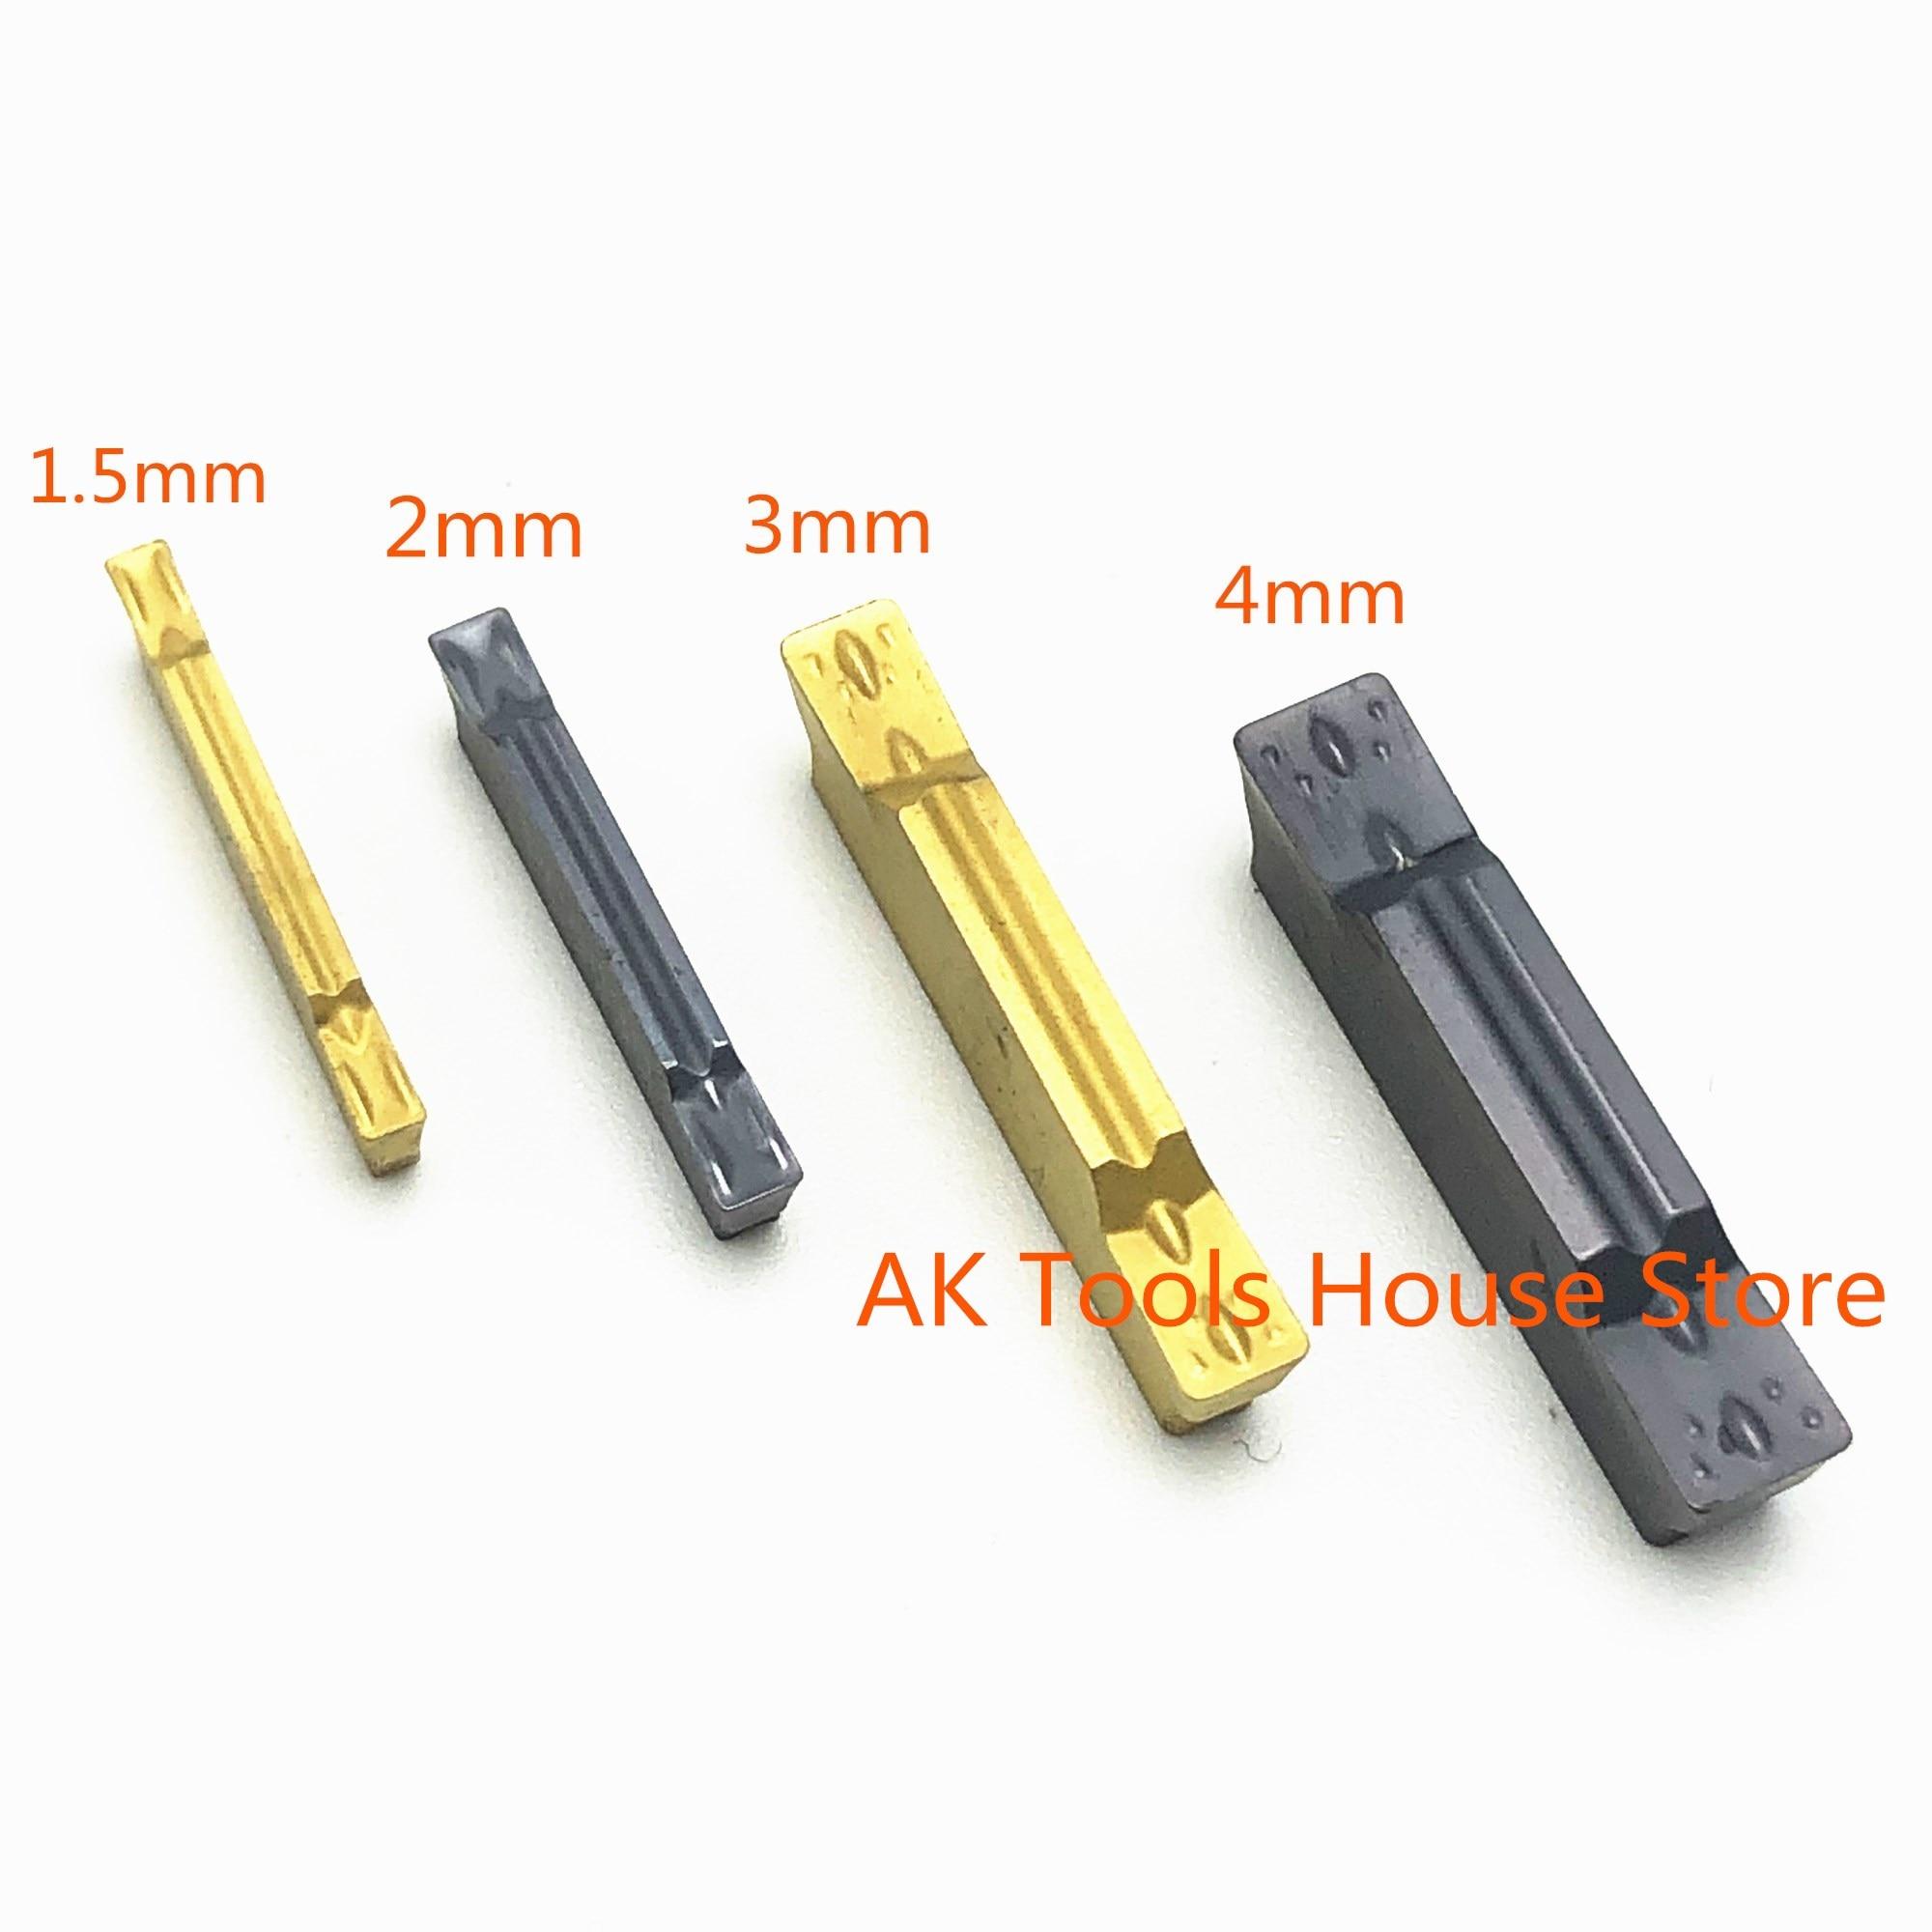 MGIVL 3mm 10× MRMN300-M NC3030 Carbide Insert for MGEHR MGIVR